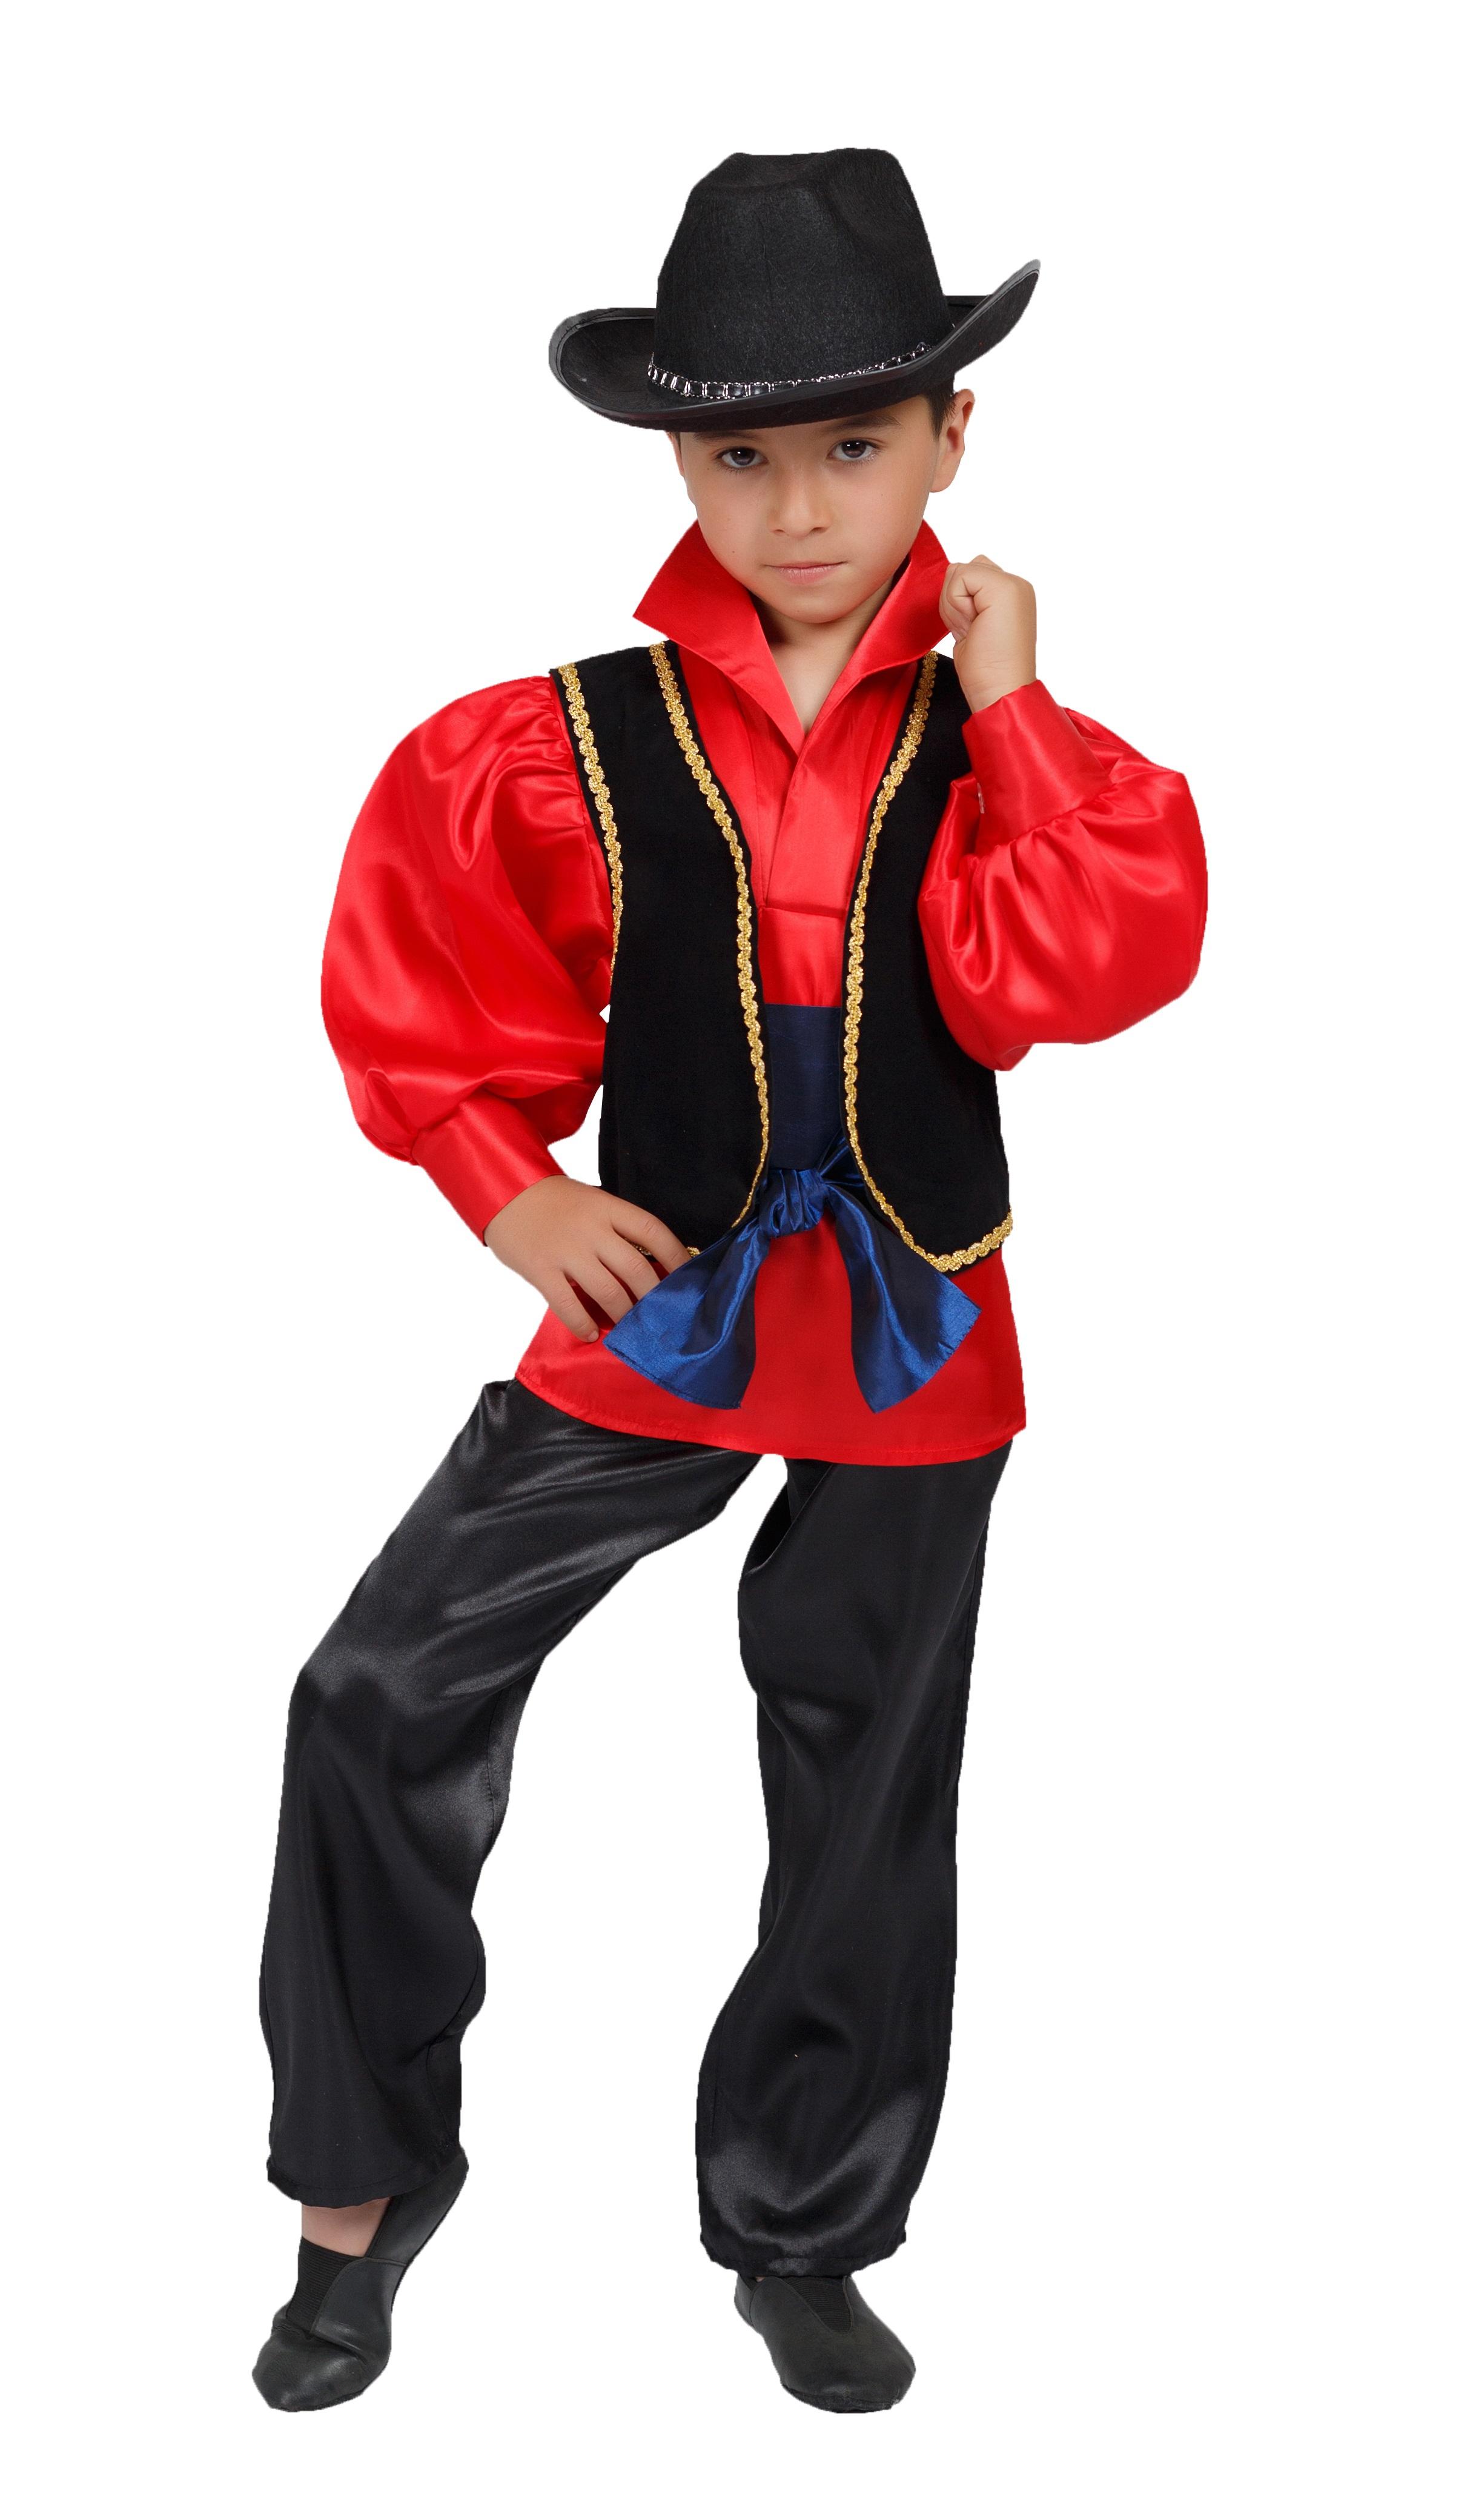 Детский костюм Цыгана (32) детский костюм зимней снежинки 32